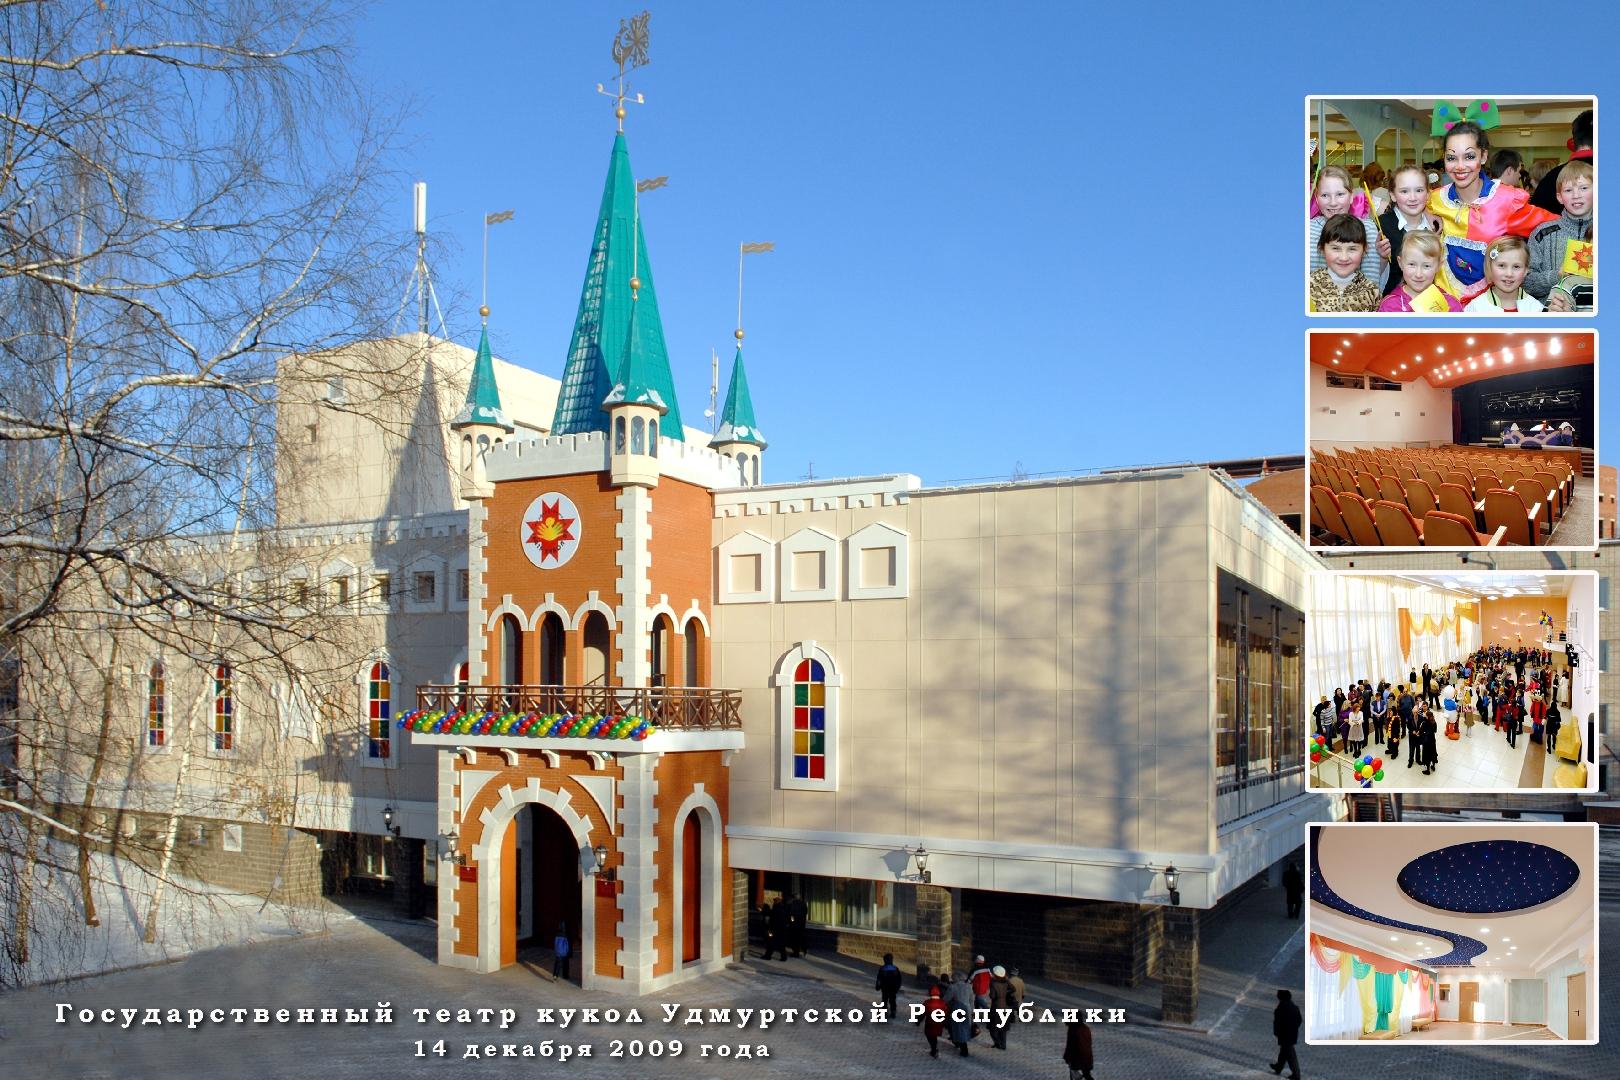 Театр кукол в Ижевске